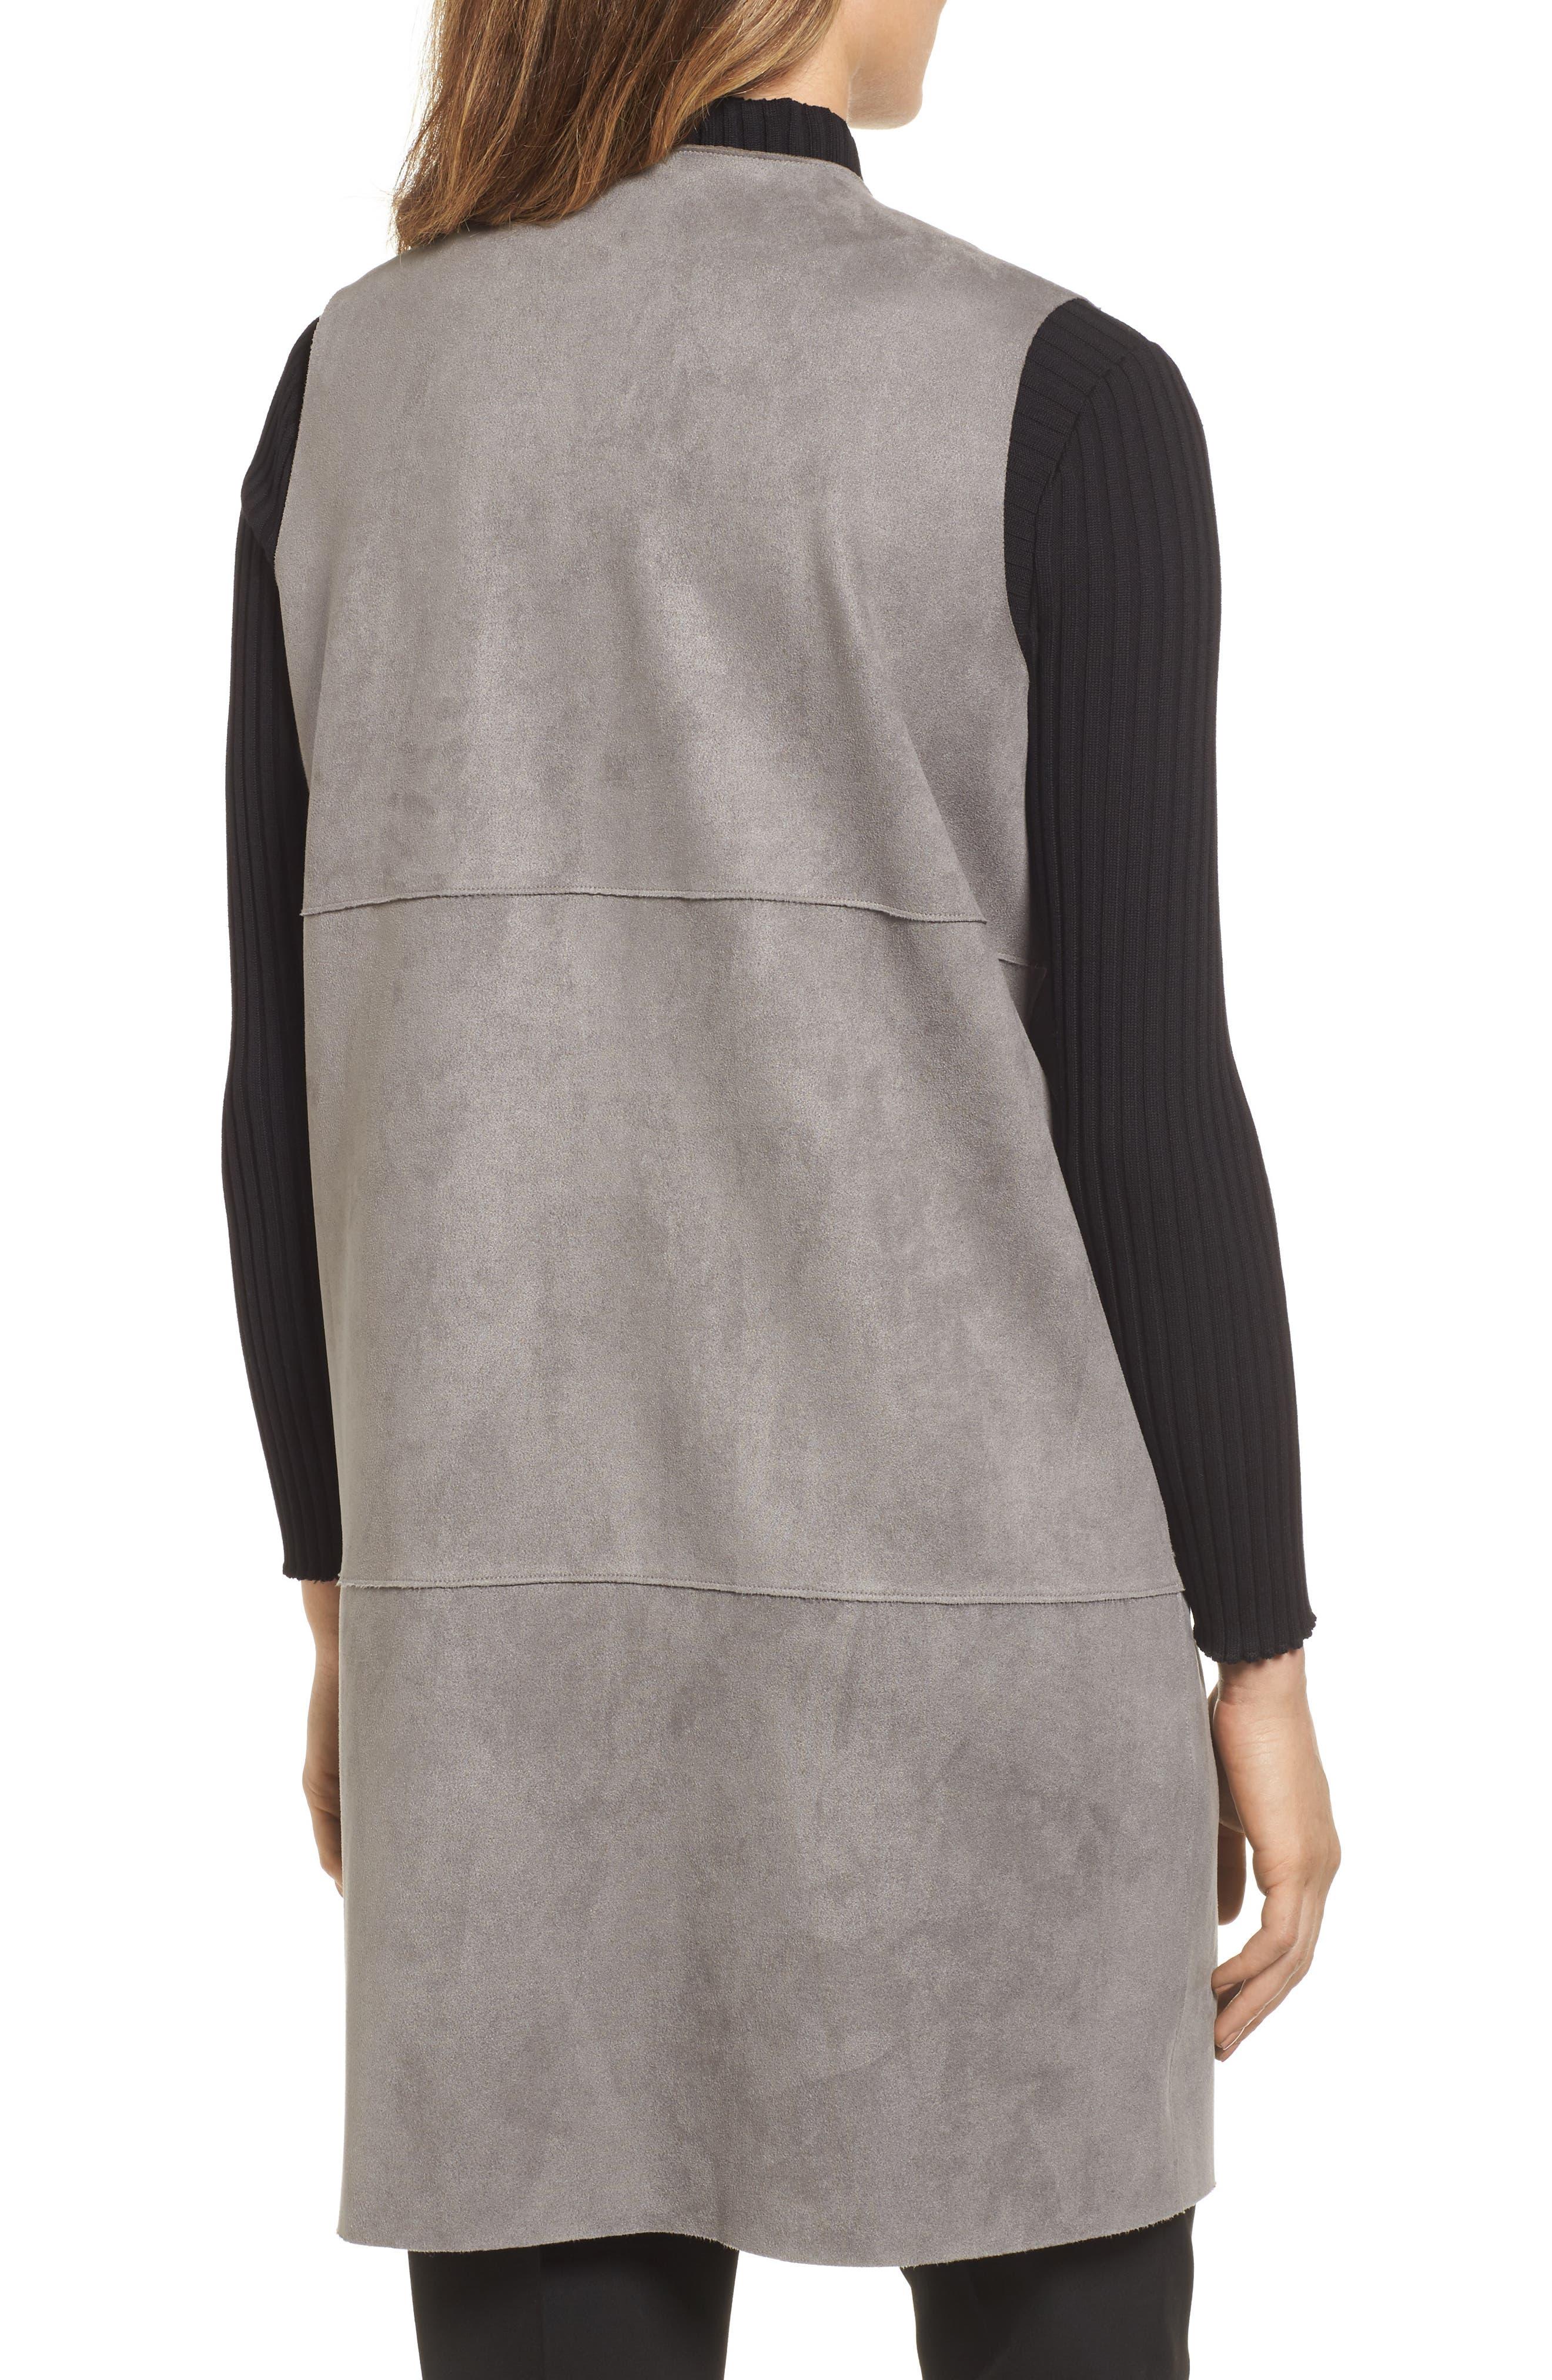 Alternate Image 2  - Ming Wang Asymmetrical Faux Suede Vest